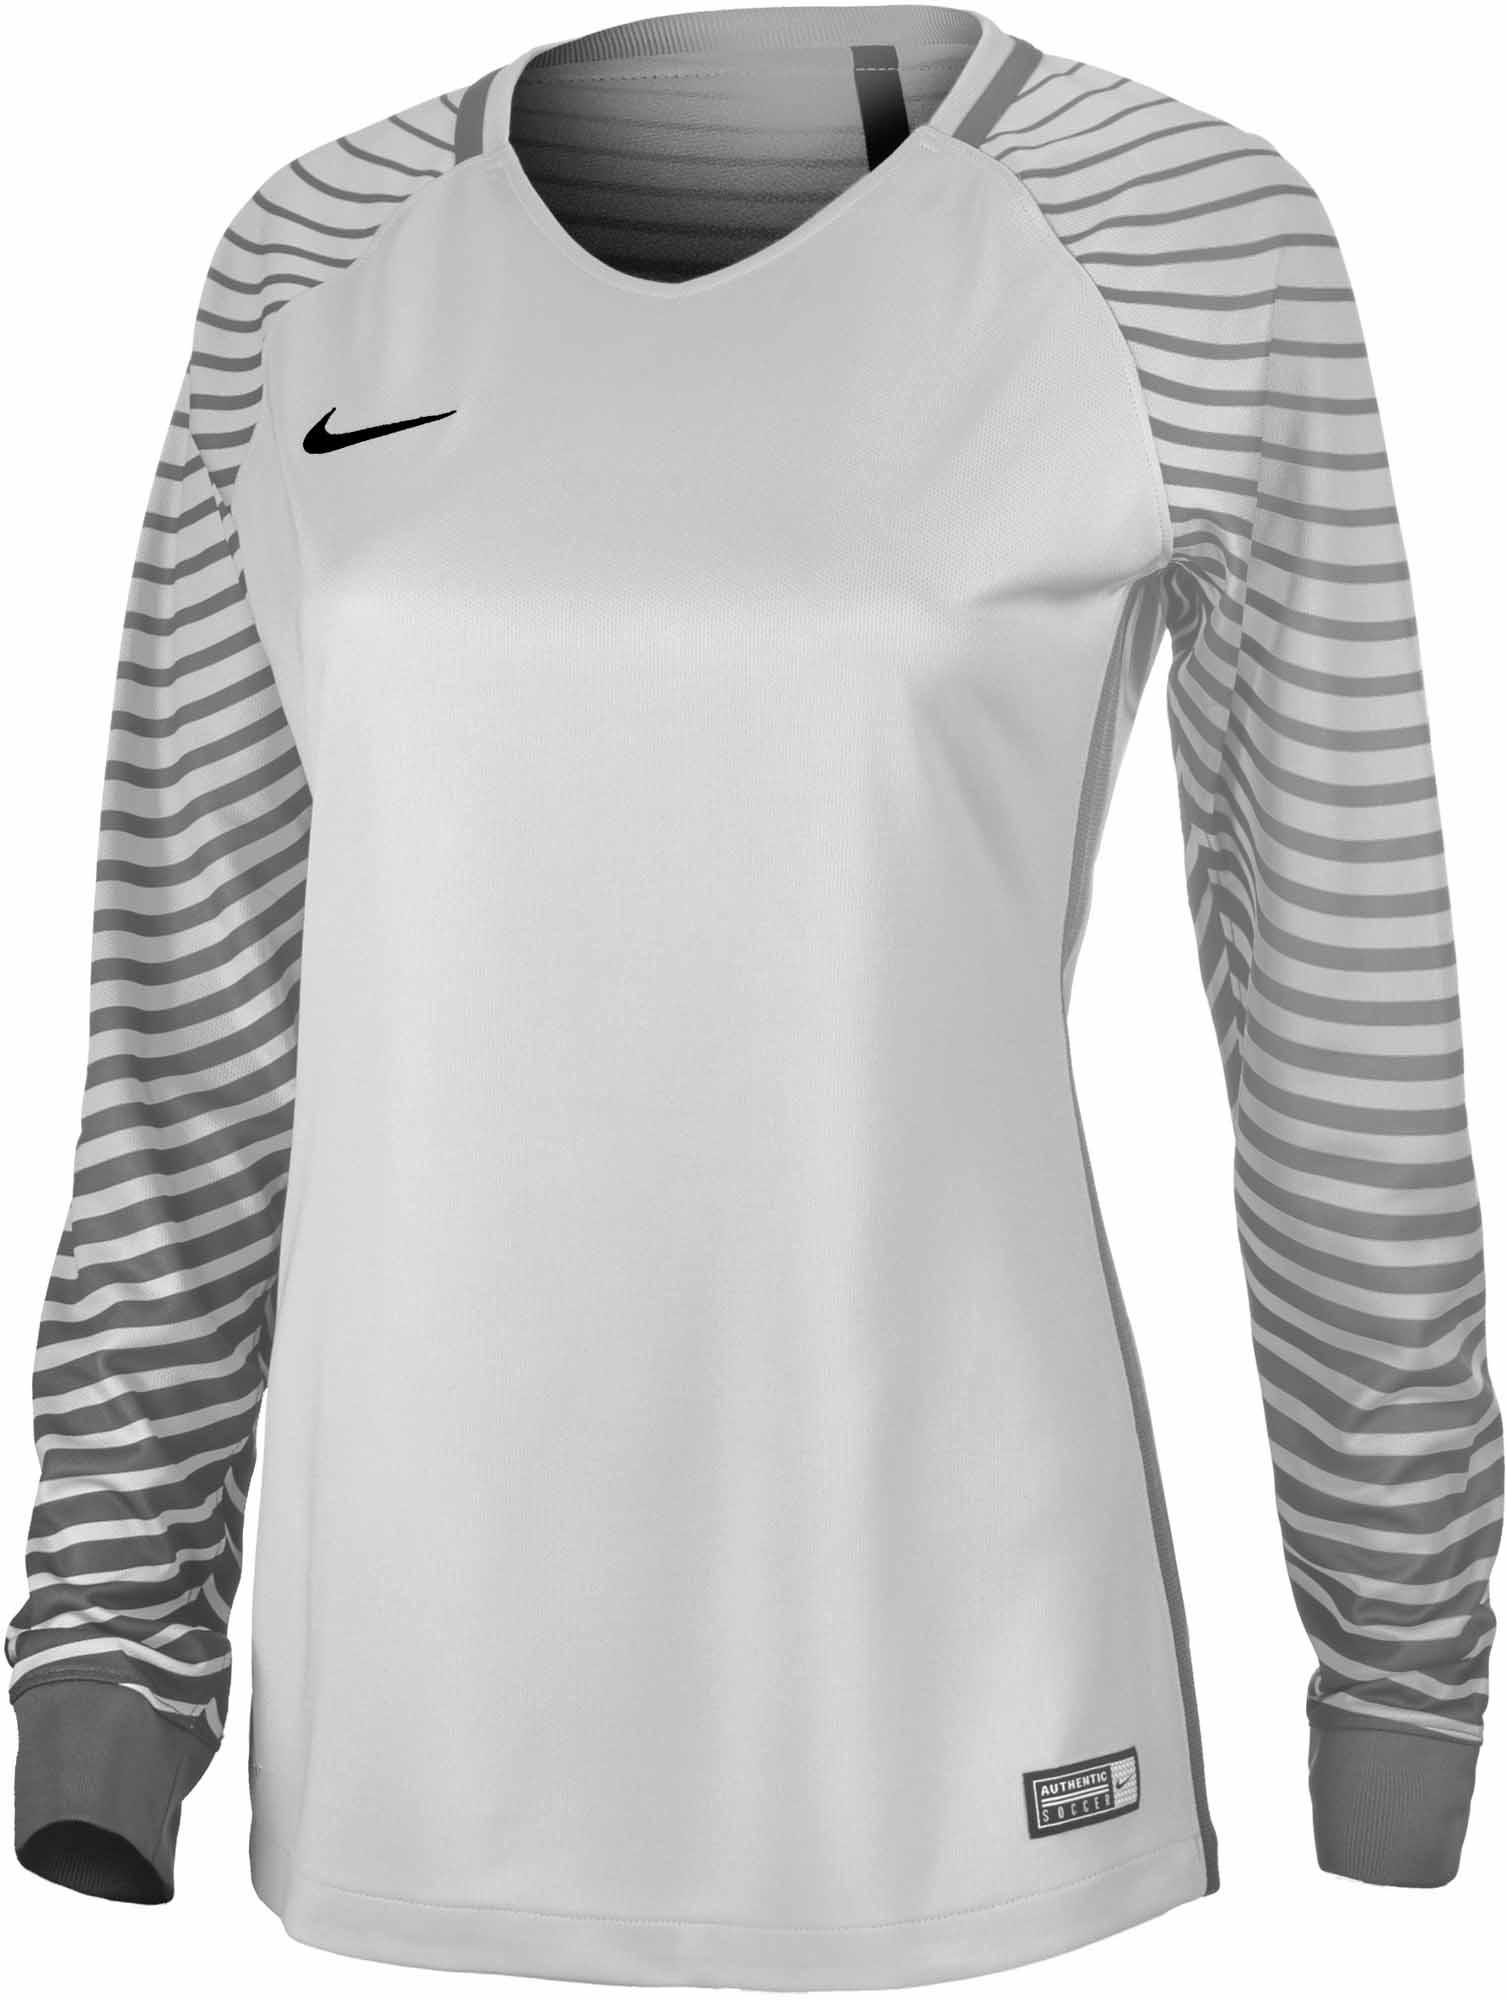 3df32a639 Nike Womens Gardien Goalkeeper Jersey - Pure Platinum   Cool Grey